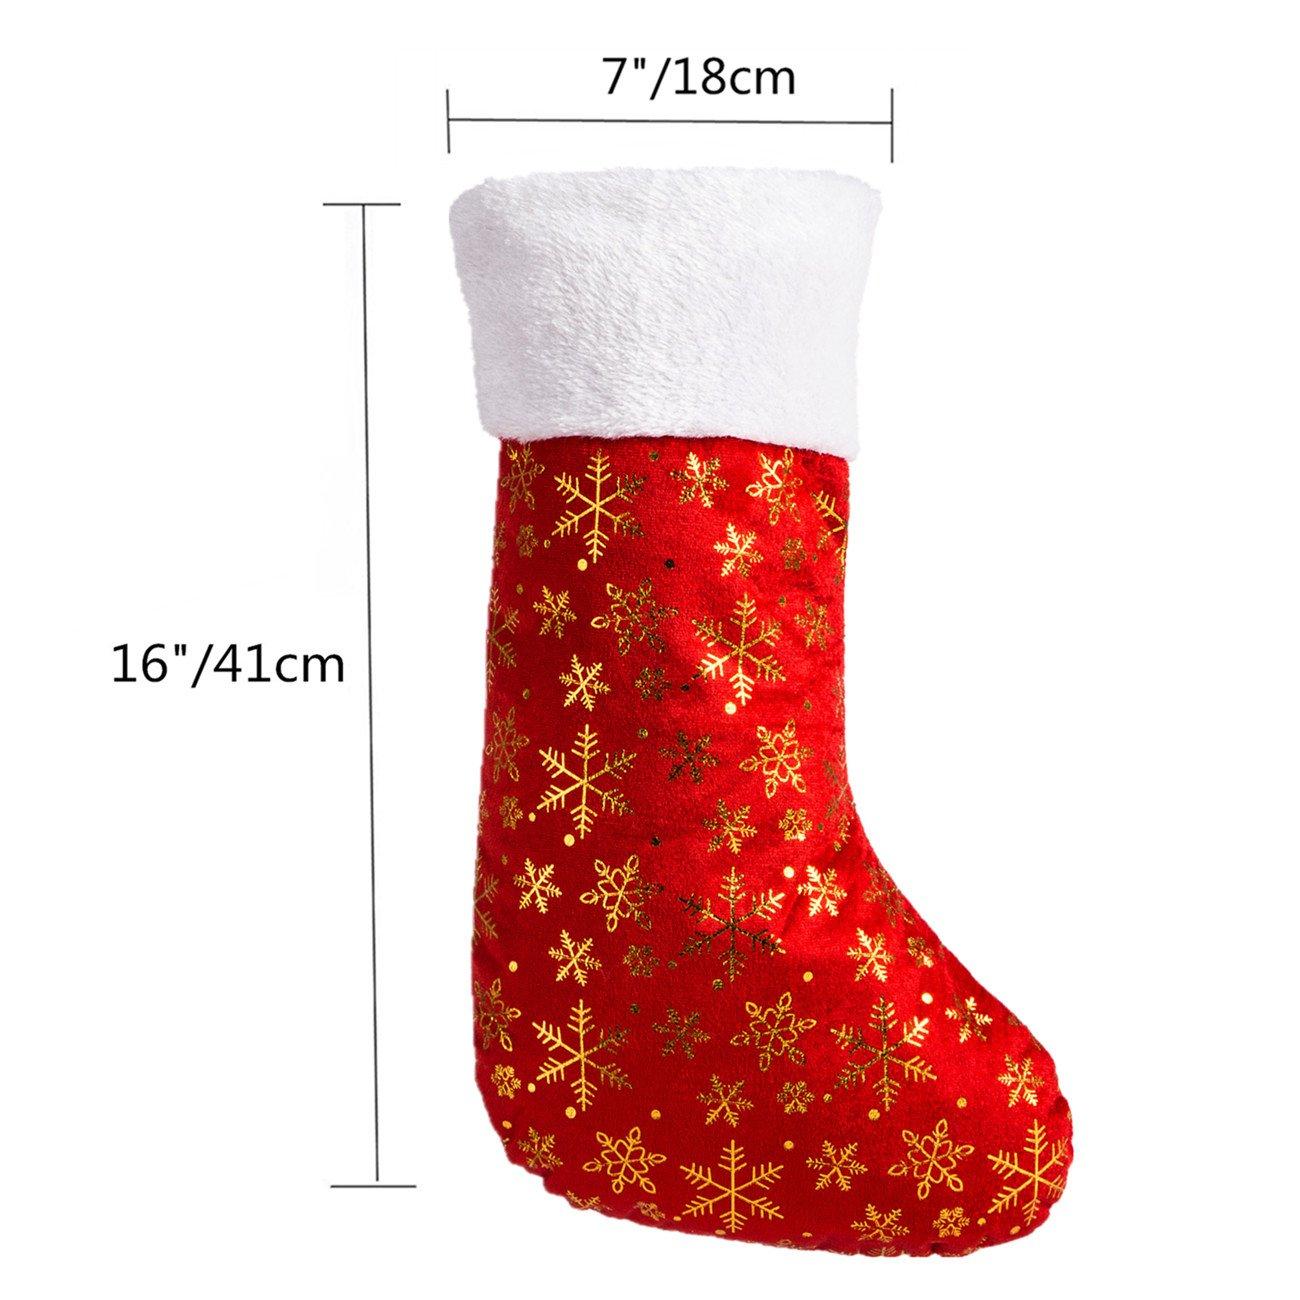 "Amazon.com: SANNO 16"" Red Christmas Stockings, Classic Craft Socks ..."